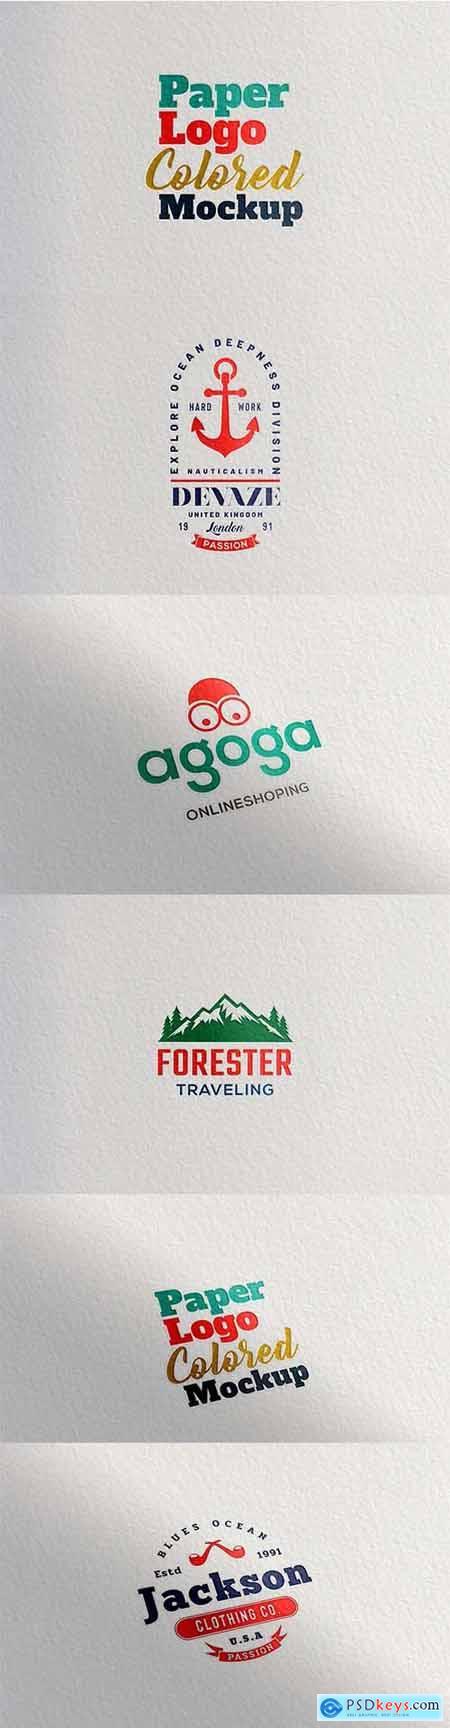 Paper Logo Colored Mockup